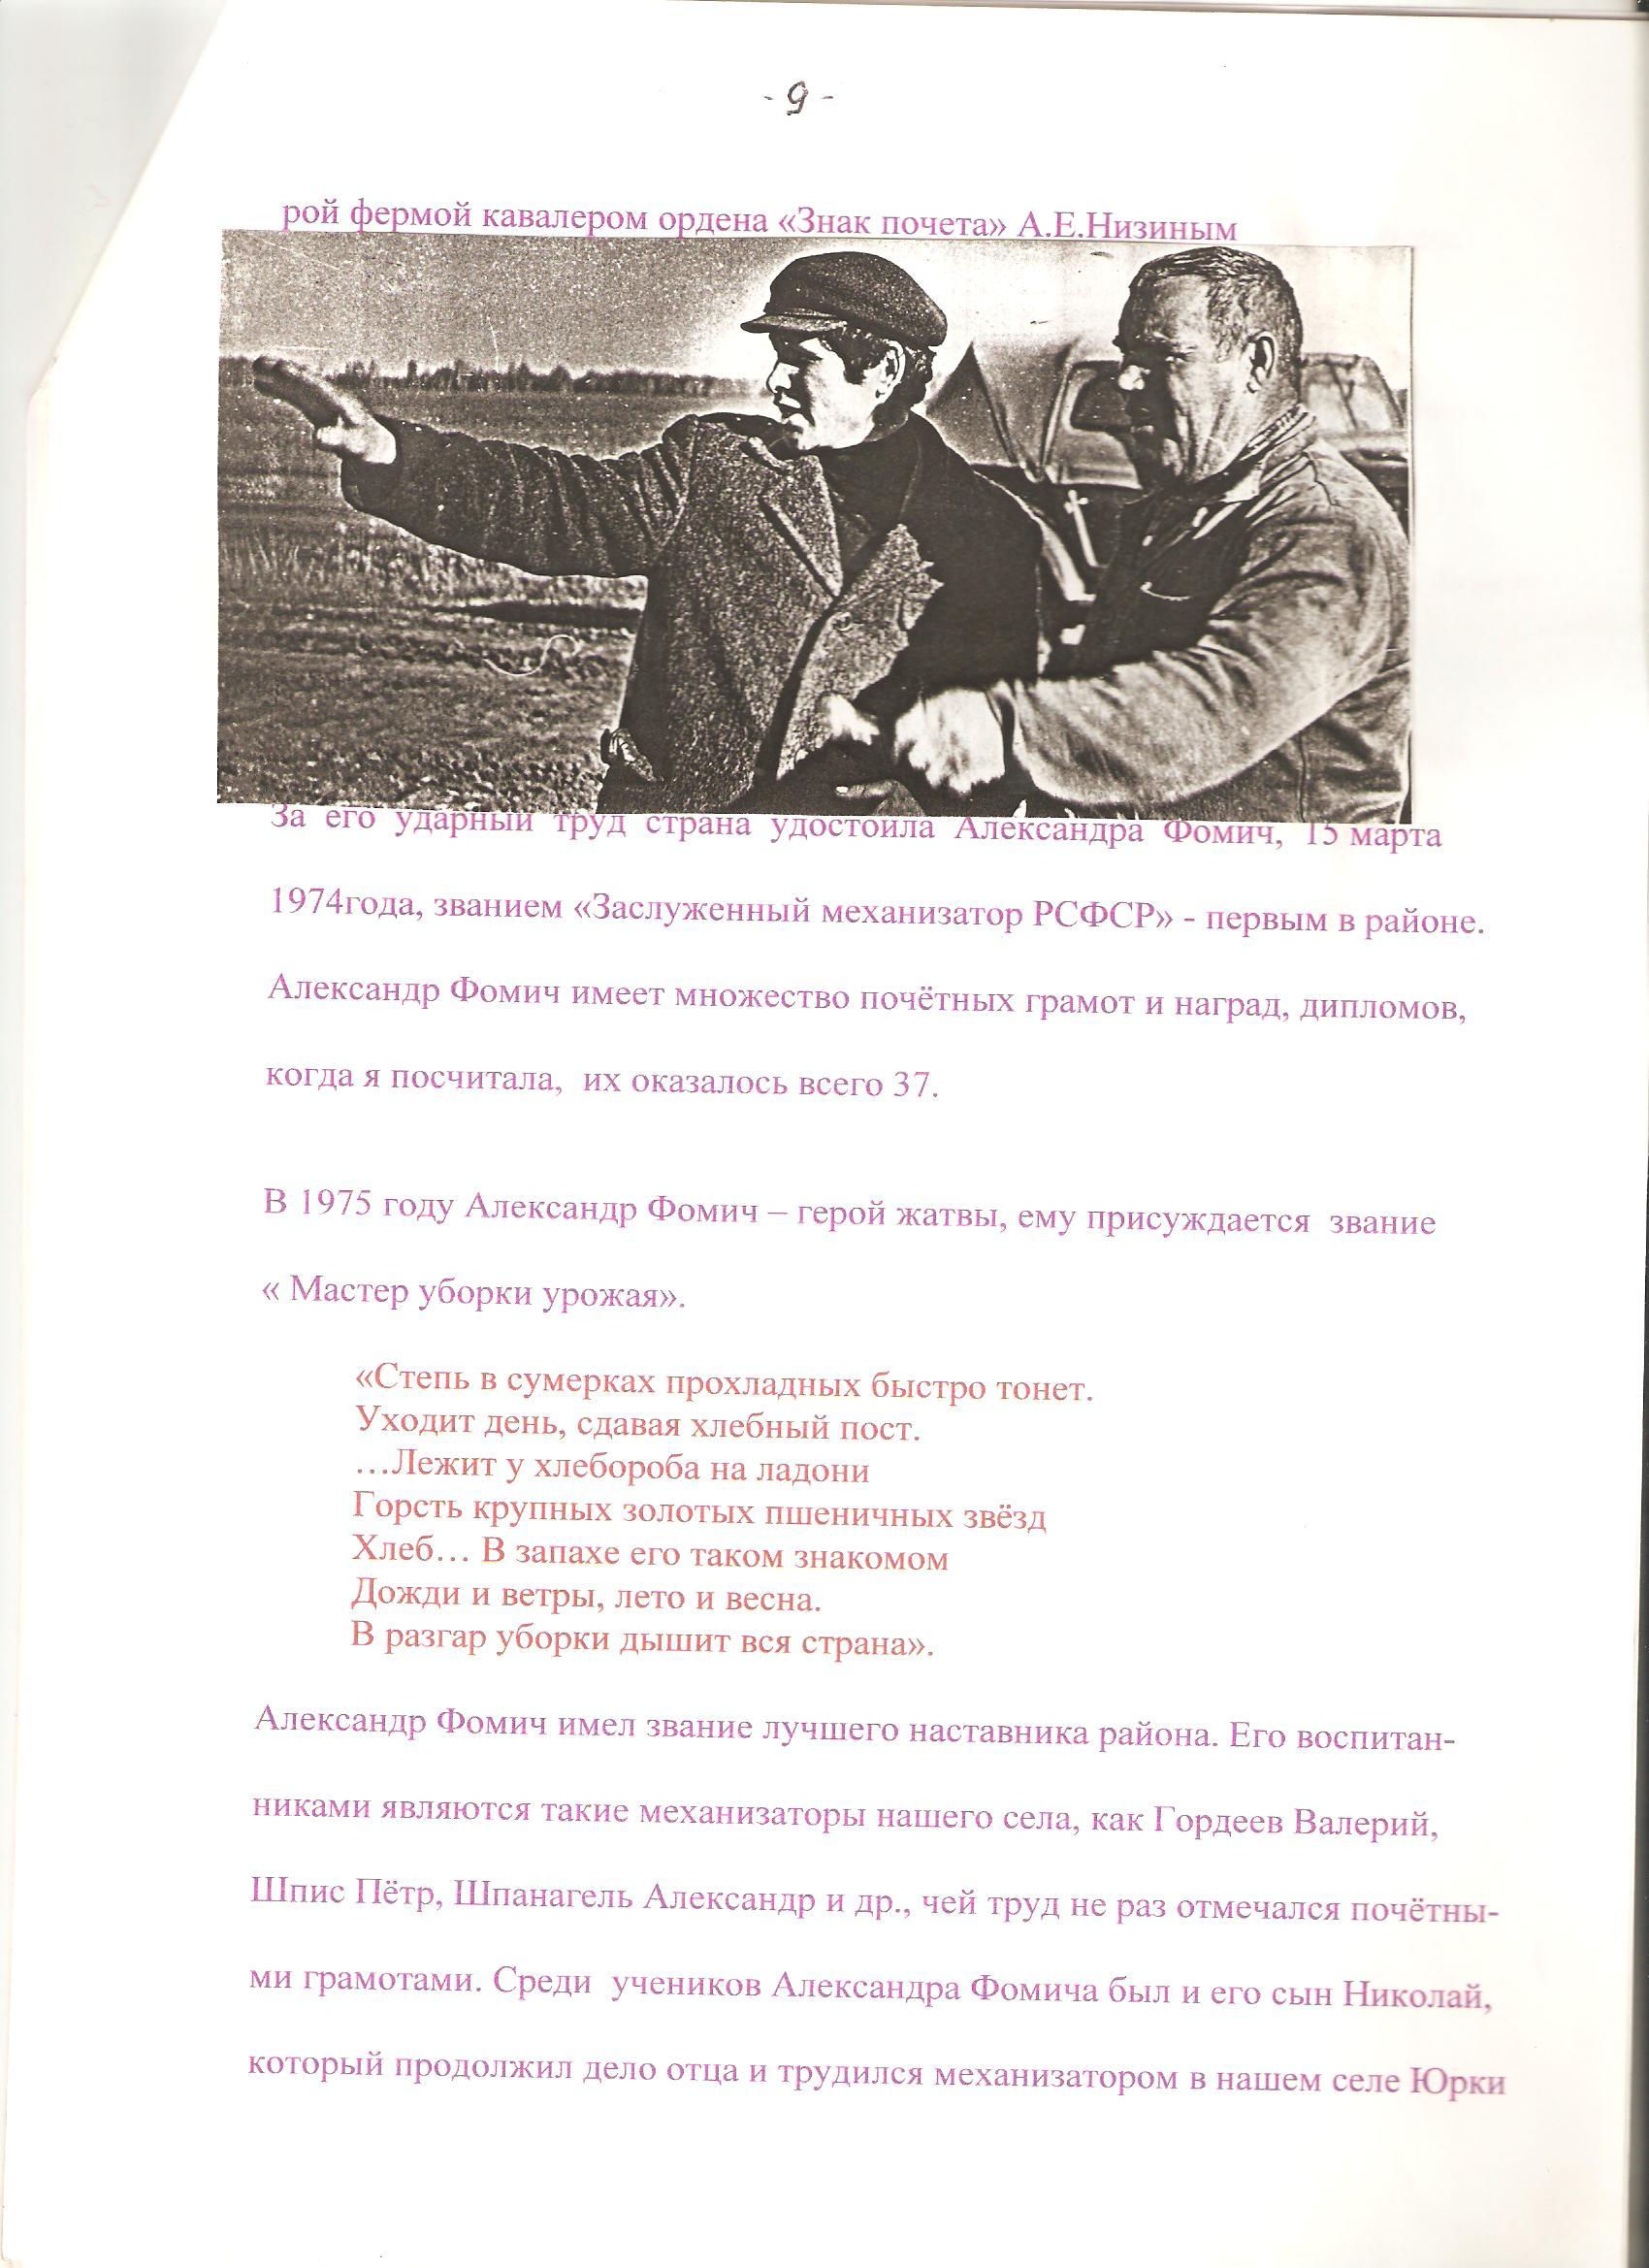 C:\Documents and Settings\USER\Рабочий стол\село2.jpg